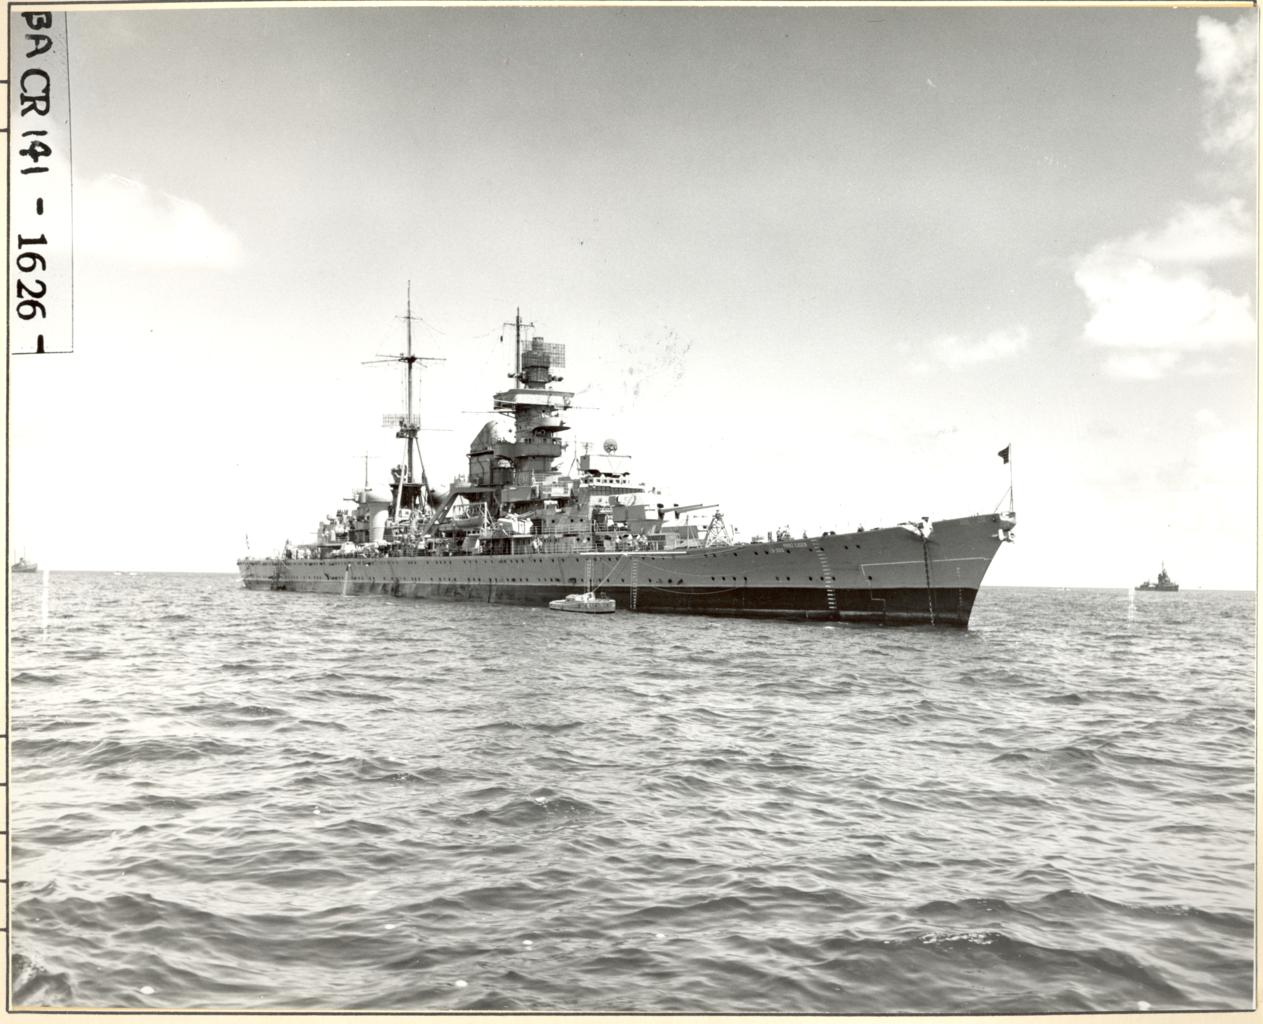 http://upload.wikimedia.org/wikipedia/commons/thumb/1/1f/USS_Prinz_Eugen_%28IX_300%29_at_sea_during_Operation_%22Crossroads%22._%C2%BE_view_STBD_forward._-_NARA_-_80-G-627445.tif/lossless-page1-1263px-USS_Prinz_Eugen_%28IX_300%29_at_sea_during_Operation_%22Crossroads%22._%C2%BE_view_STBD_forward._-_NARA_-_80-G-627445.tif.png